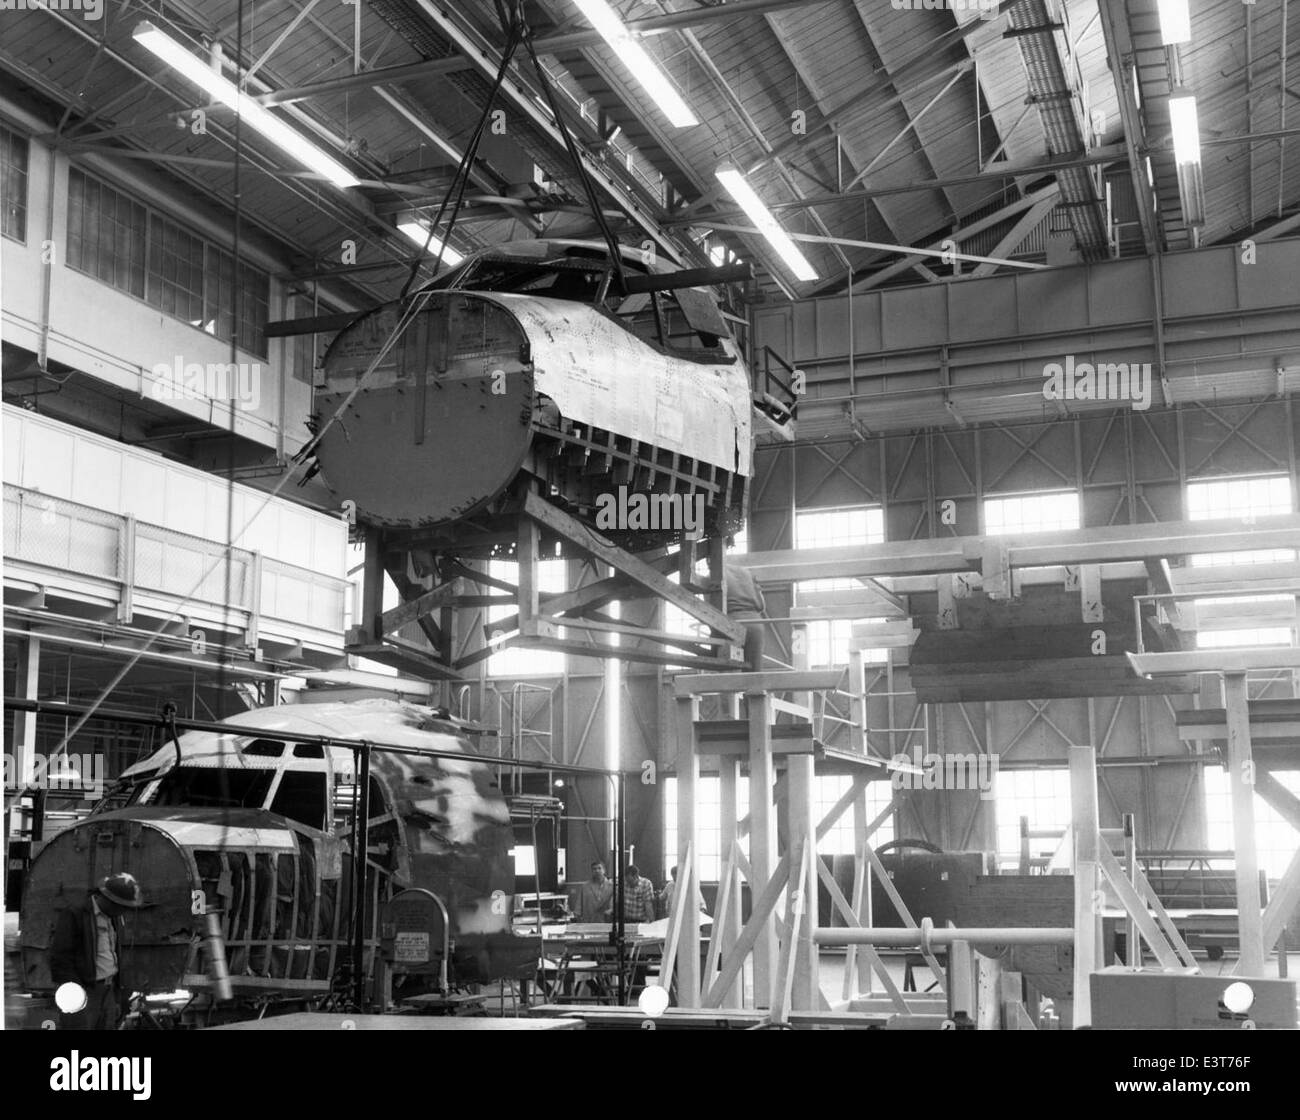 Convair, fuselage stress tests - Stock Image